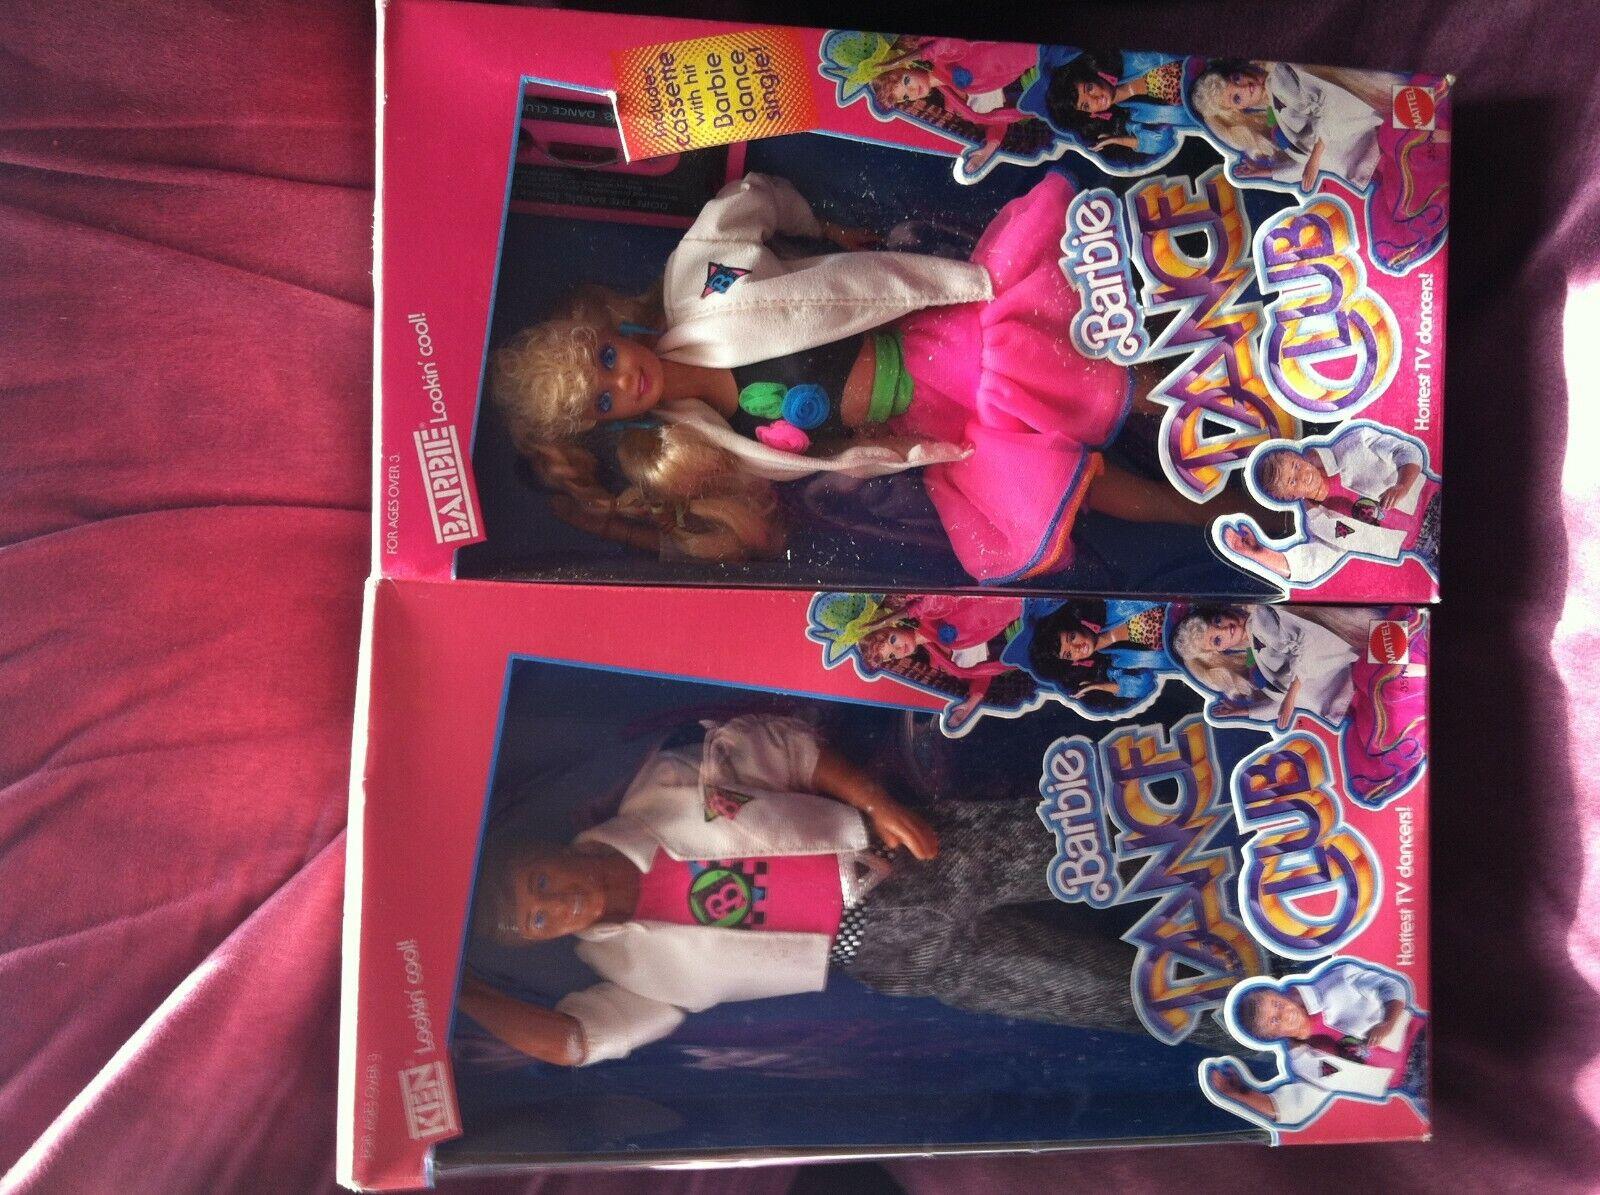 2 Vintage 1989 Dance Club Barbie &  Handsomer Ken  Lookin cool  Dolls ALMINT